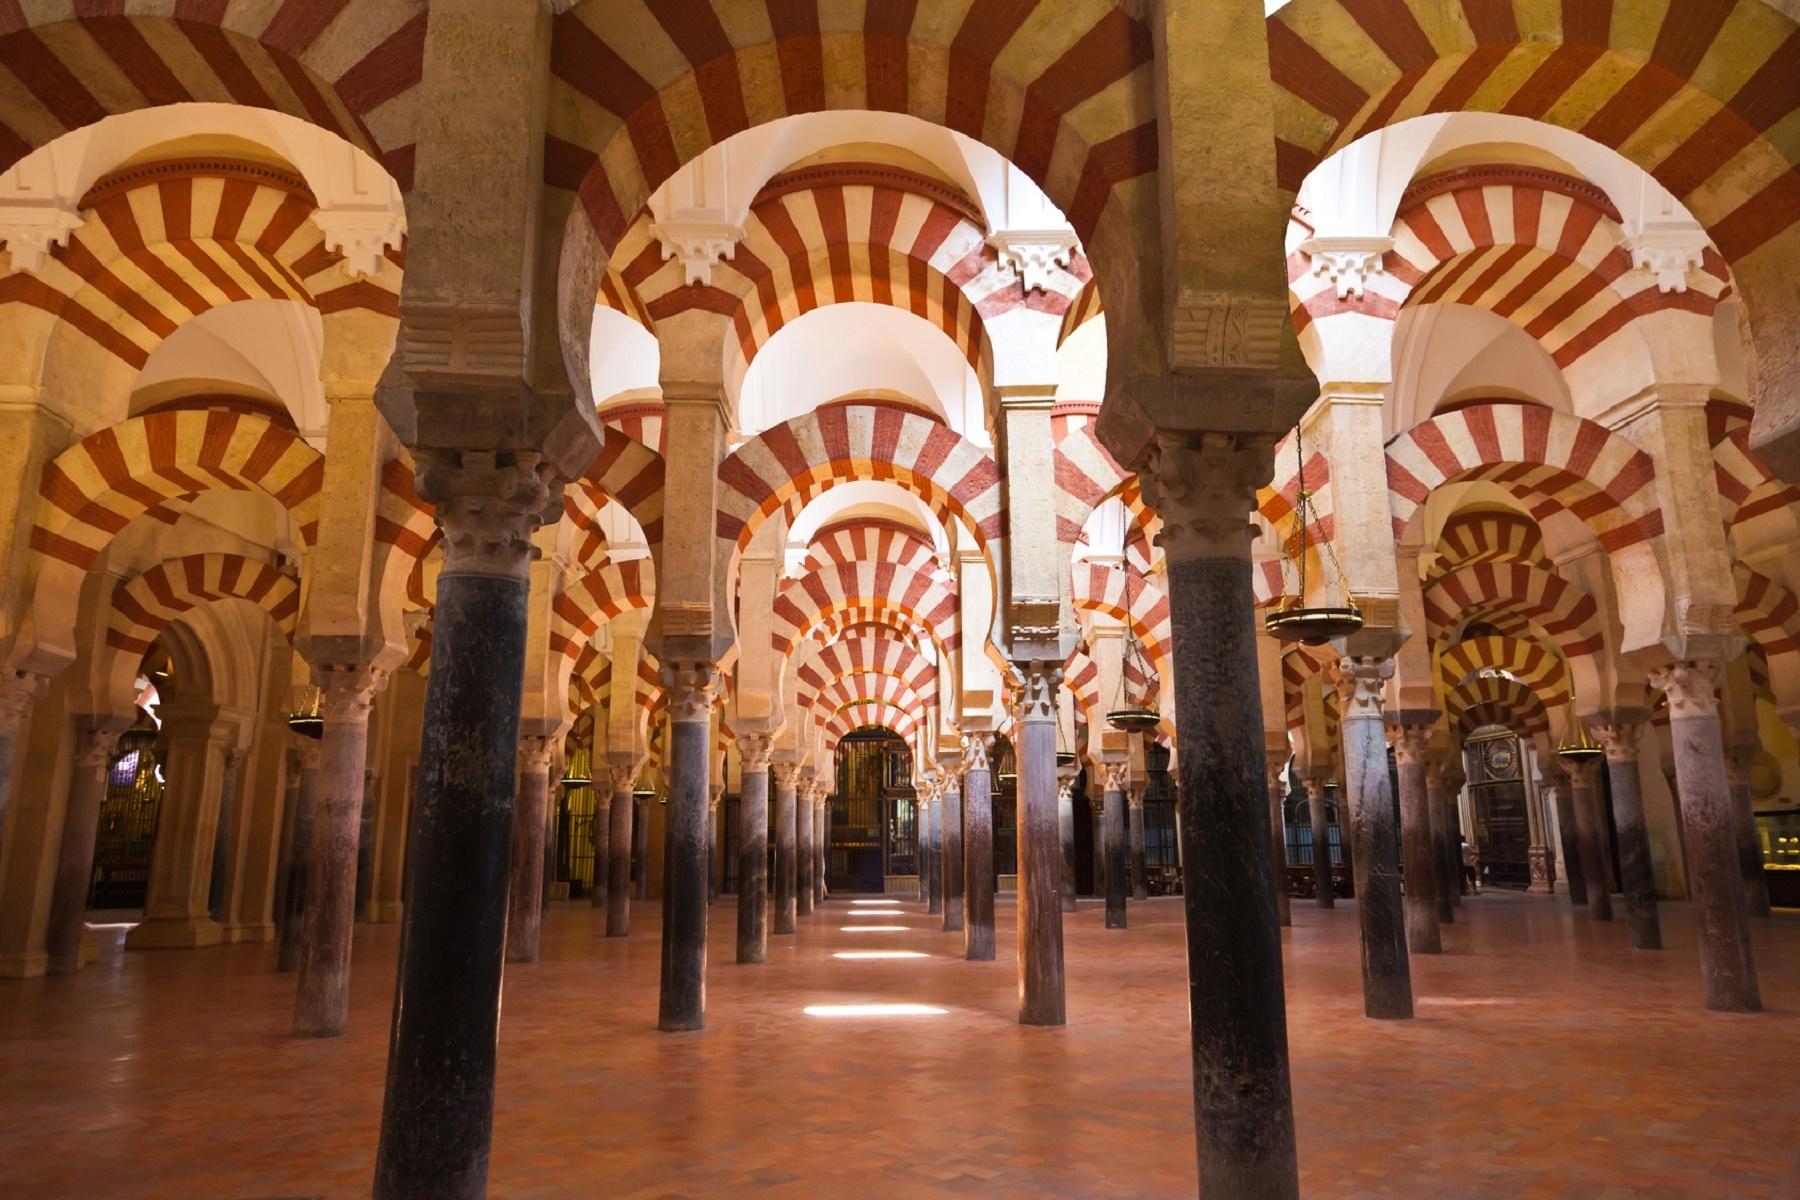 Arabic arches hallway in Corodoba's mosque. Spain